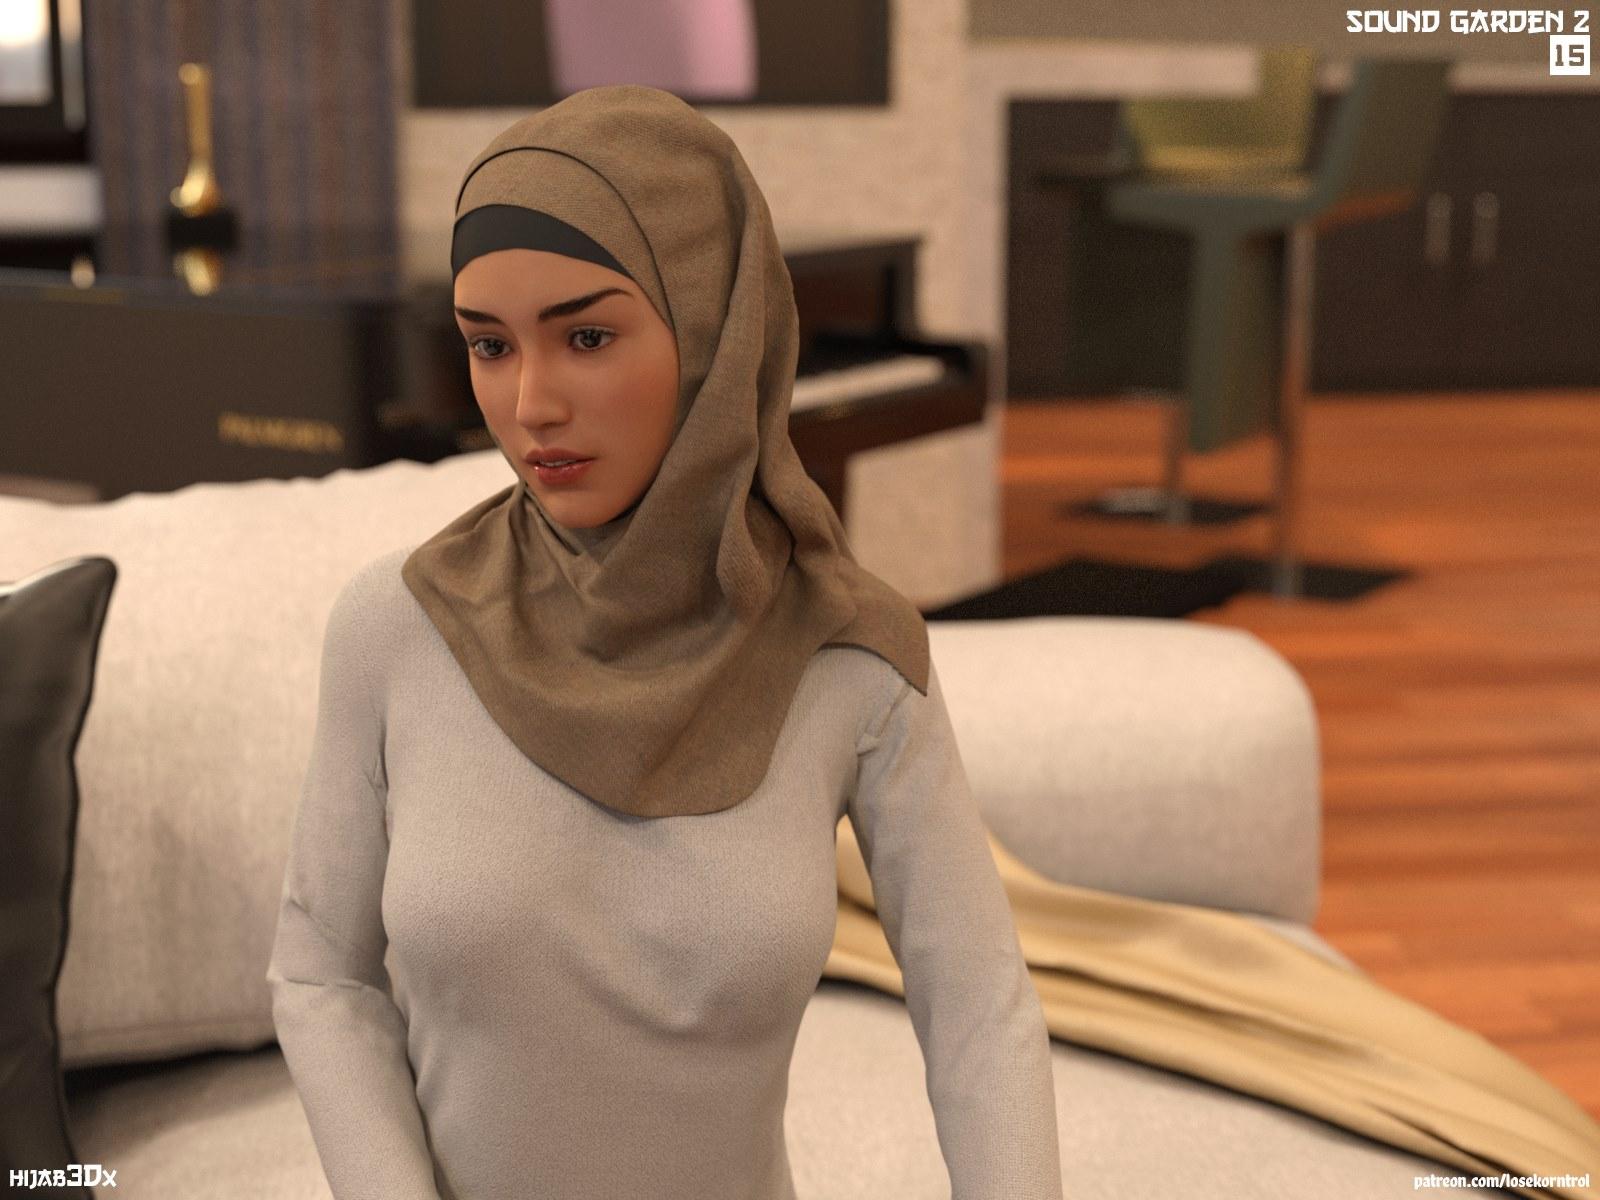 3Dx Porn Game hijab 3dx- sound garden 2 - losekorntrol, 3d • free porn comics